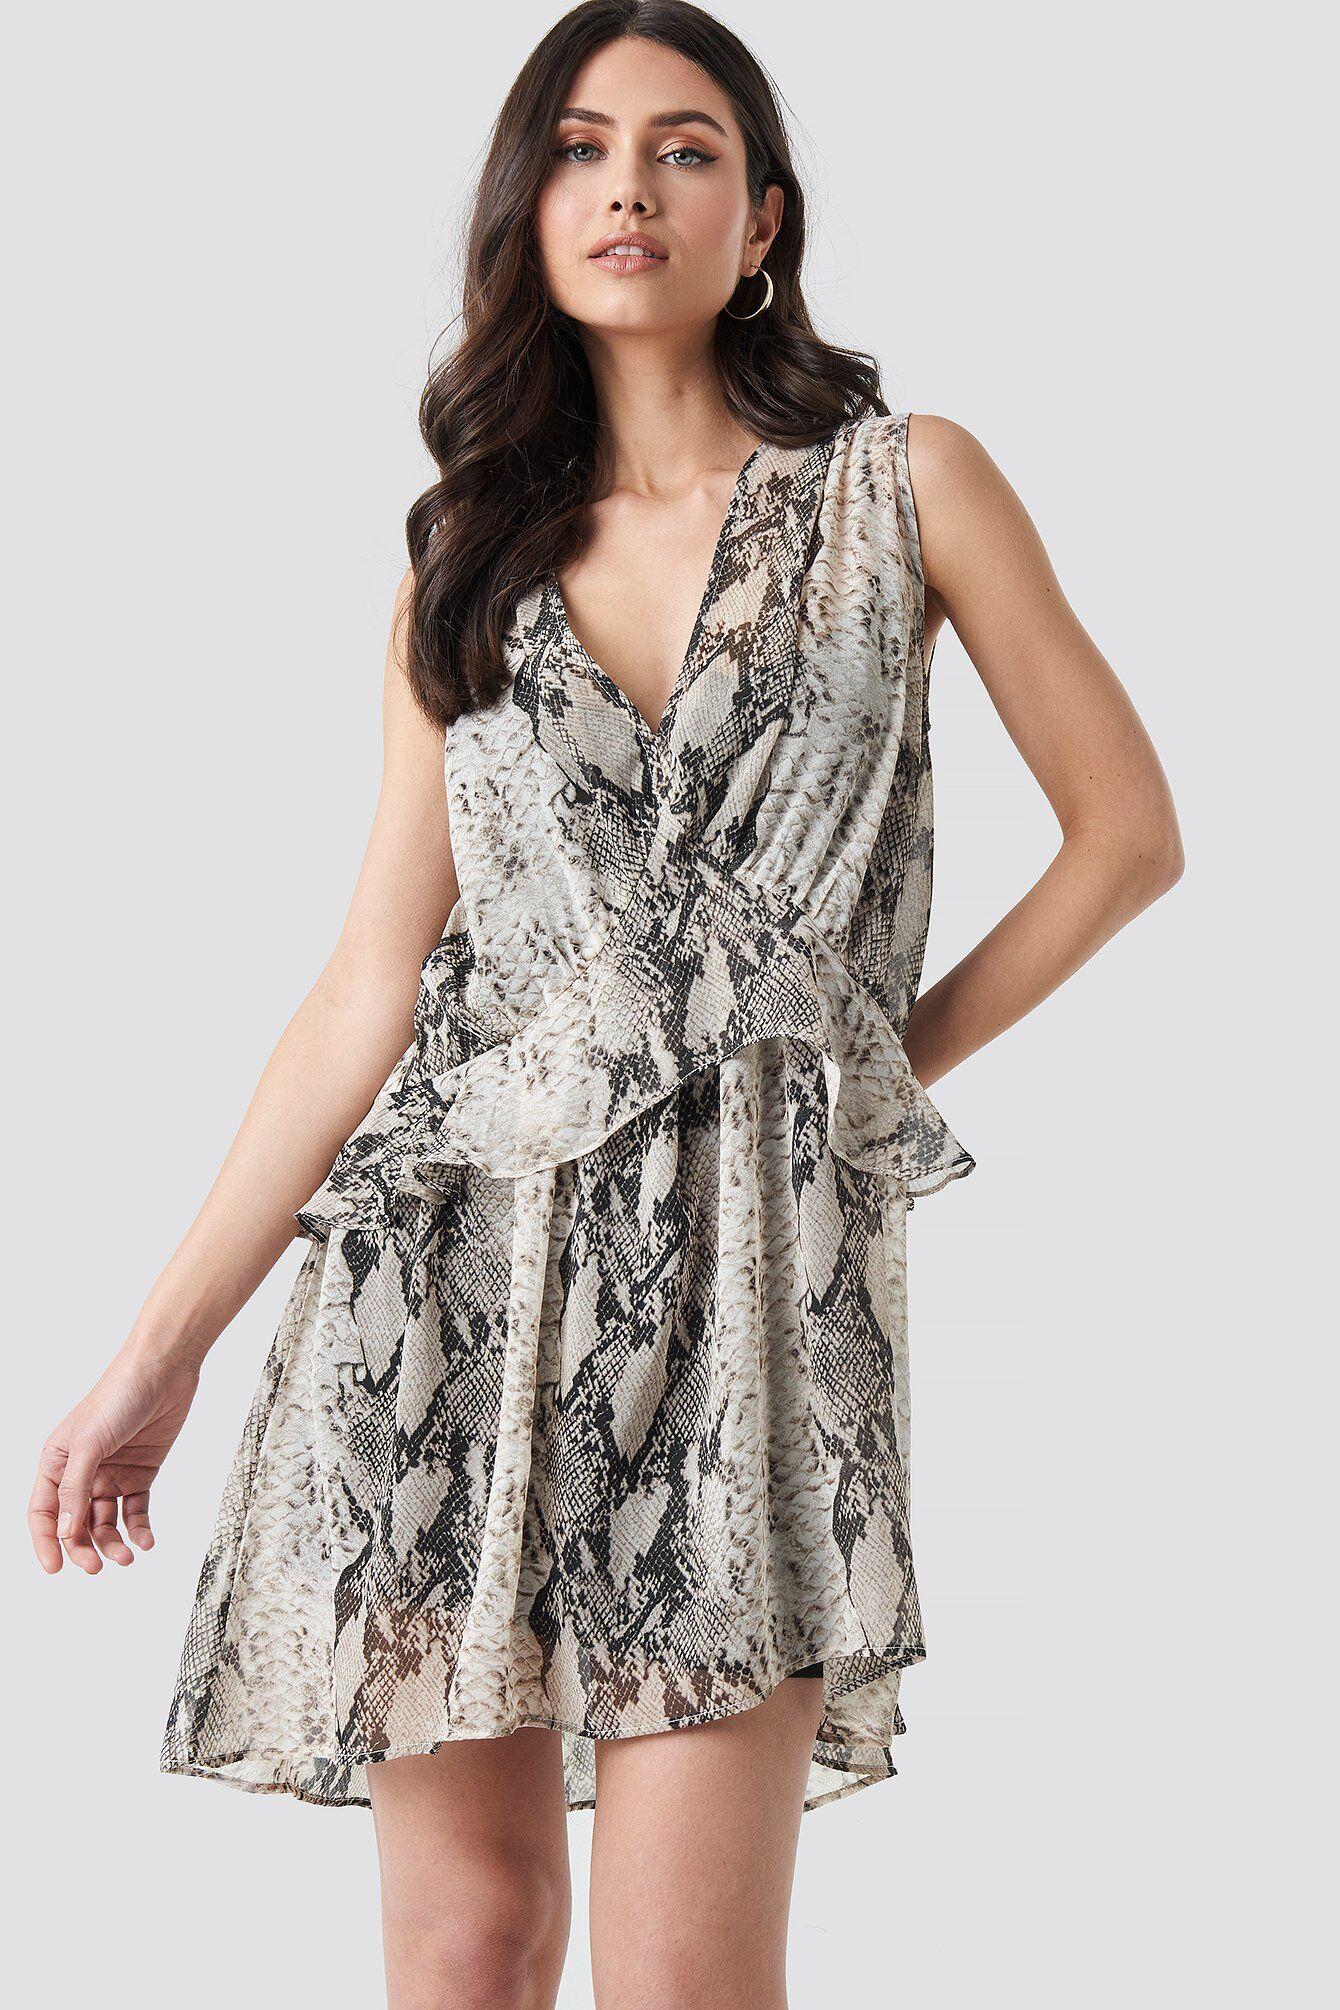 Image of NA-KD Trend Snake printed Short Chiffon Dress - Grey,Multicolor